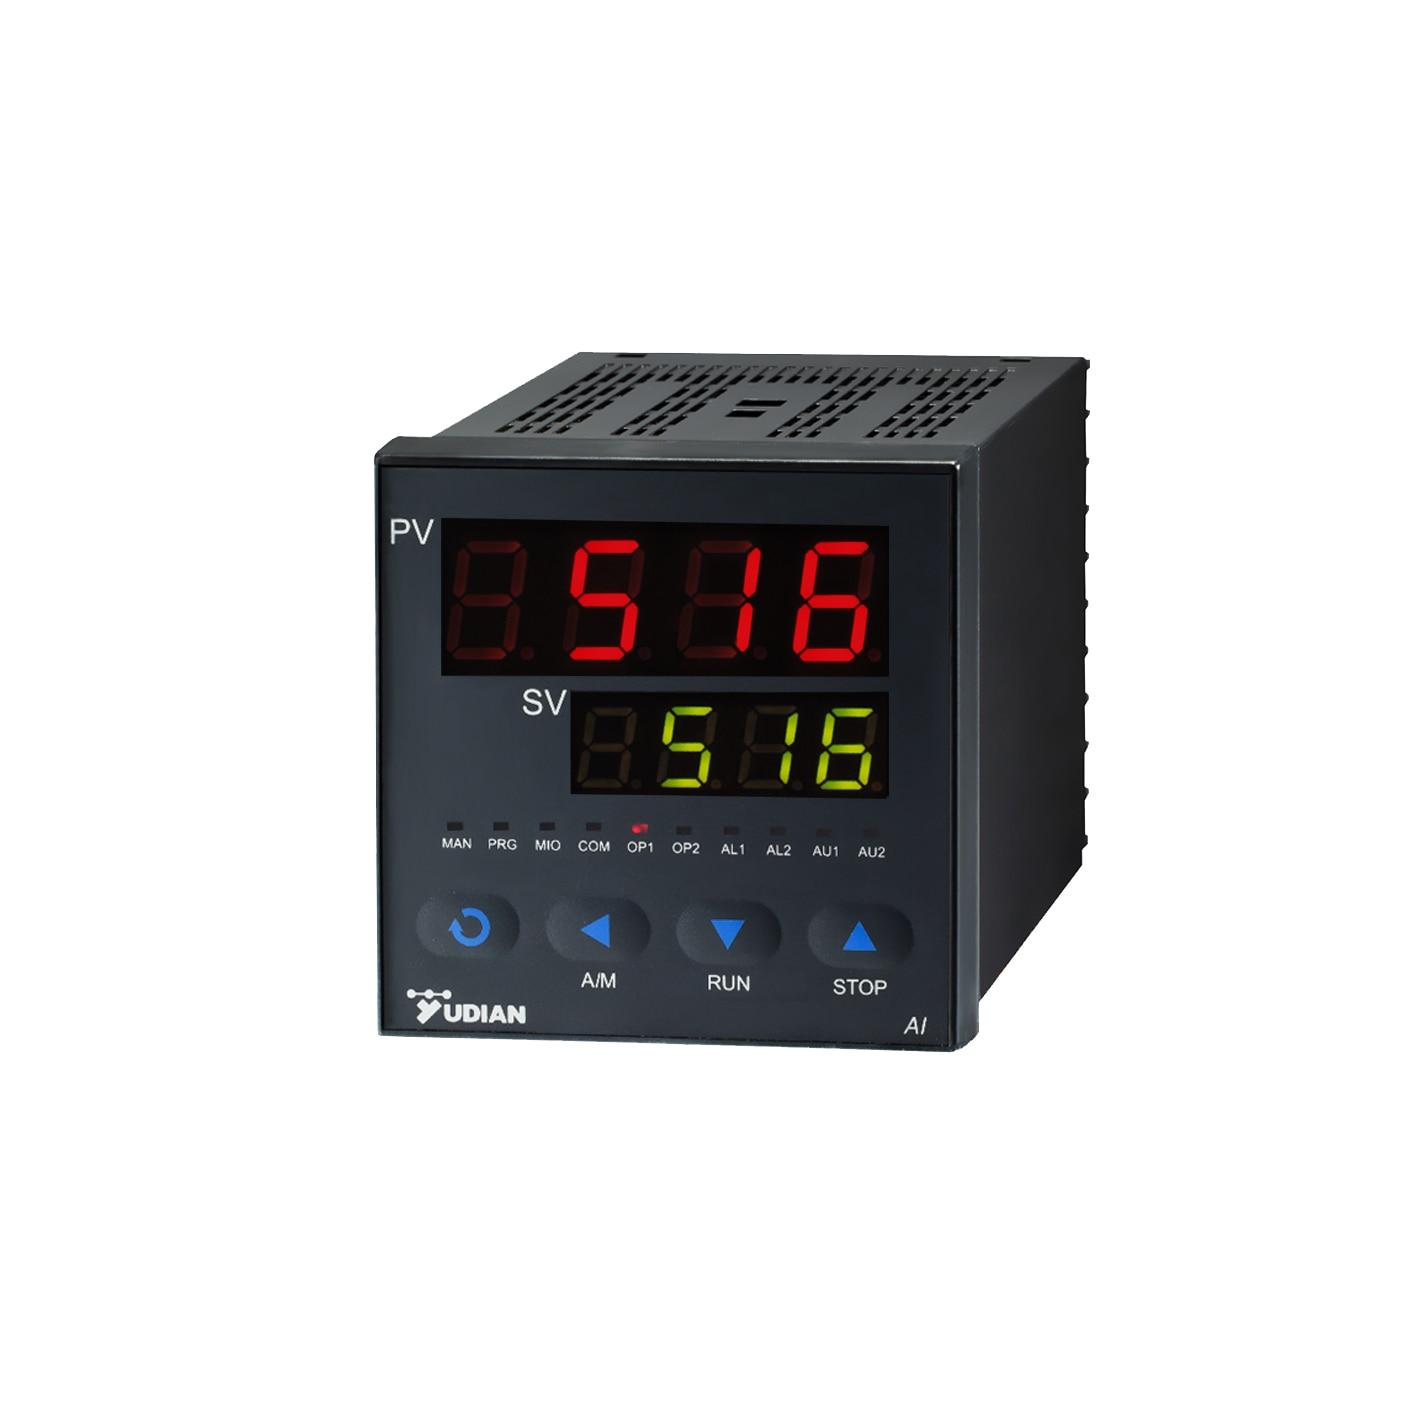 Yudian ذكي متحكم في درجة الحرارة AI-516 ترموستات عالية الدقة وحدة تحكم في درجة الحرارة PID متحكم في درجة الحرارة AI-516D2 AI-516A AI-516D7